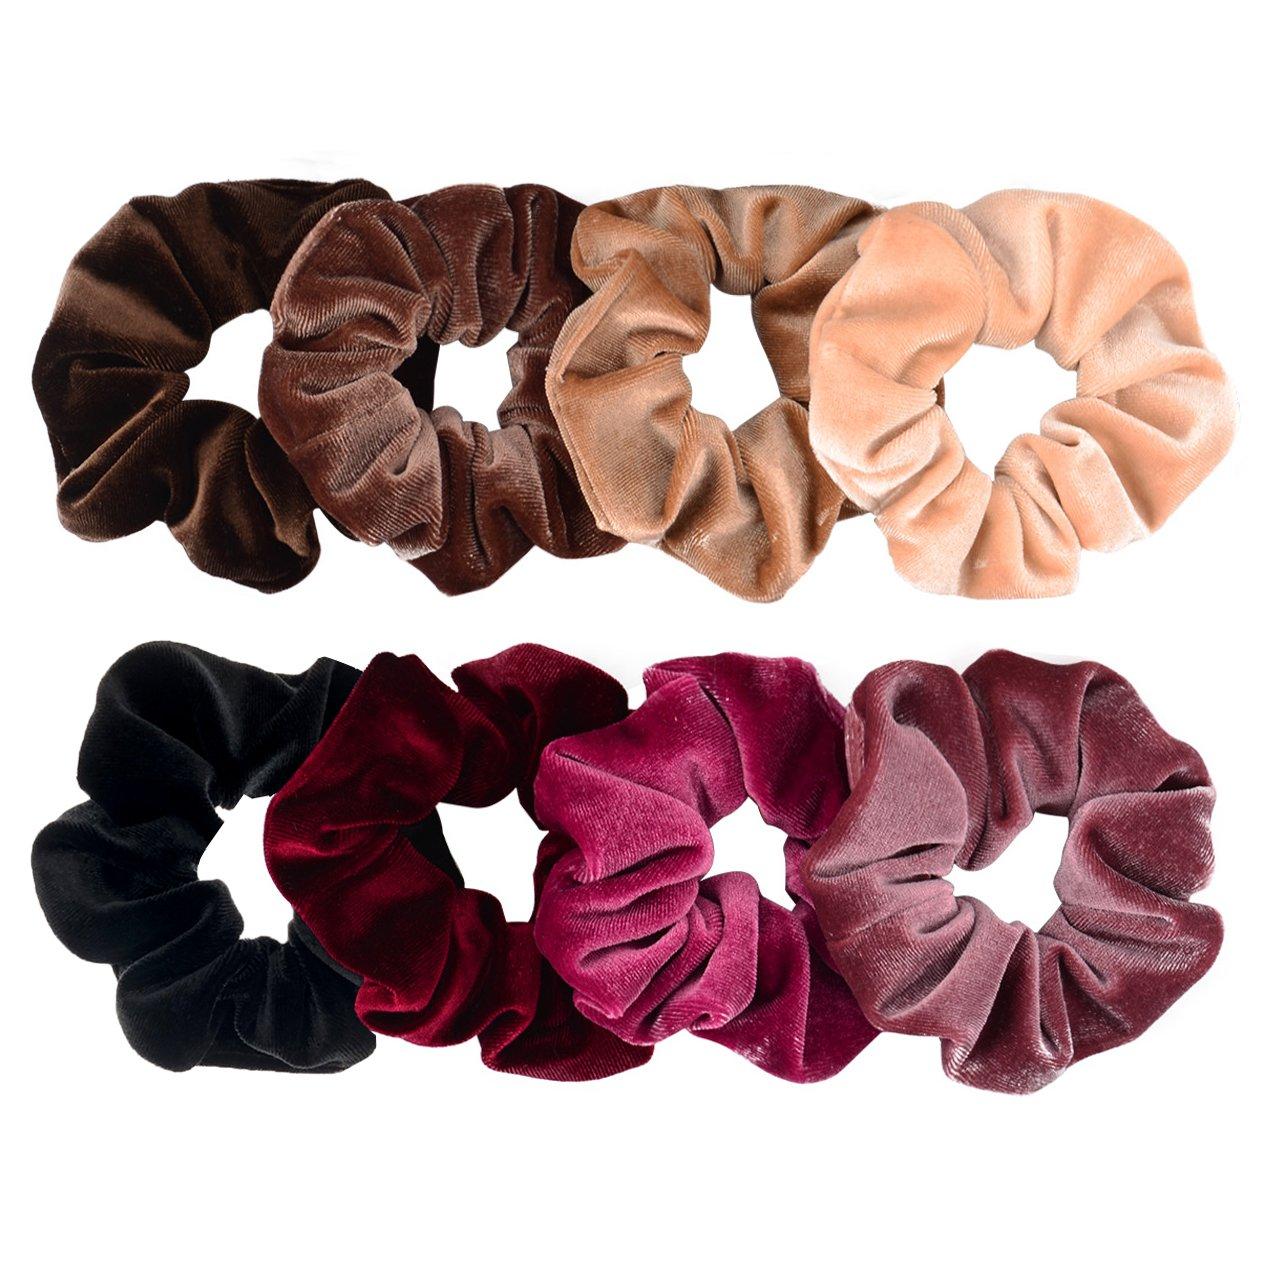 Whaline Hair Scrunchies Velvet Hair Bobble Elastics Hair Bands Soft Hair Ties for Women and Girls, 8 Pieces